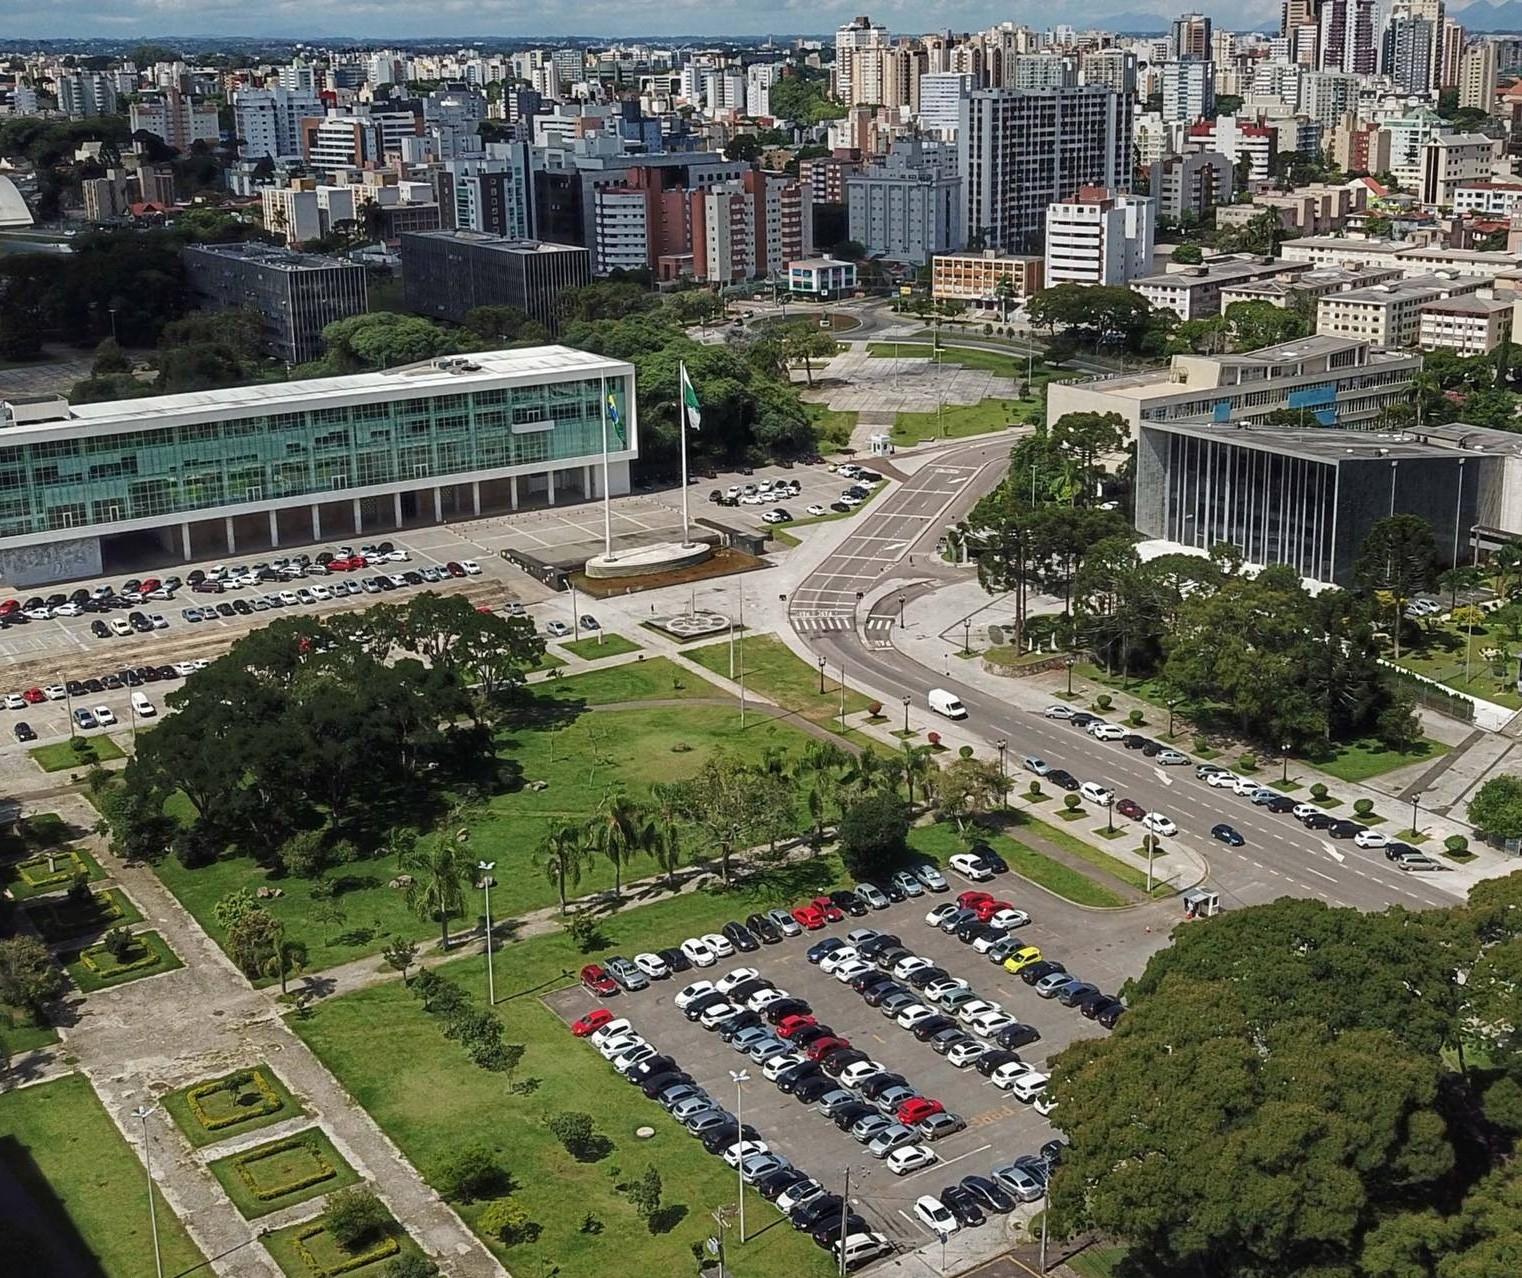 Decreto estadual prorroga medidas restritivas por mais 15 dias